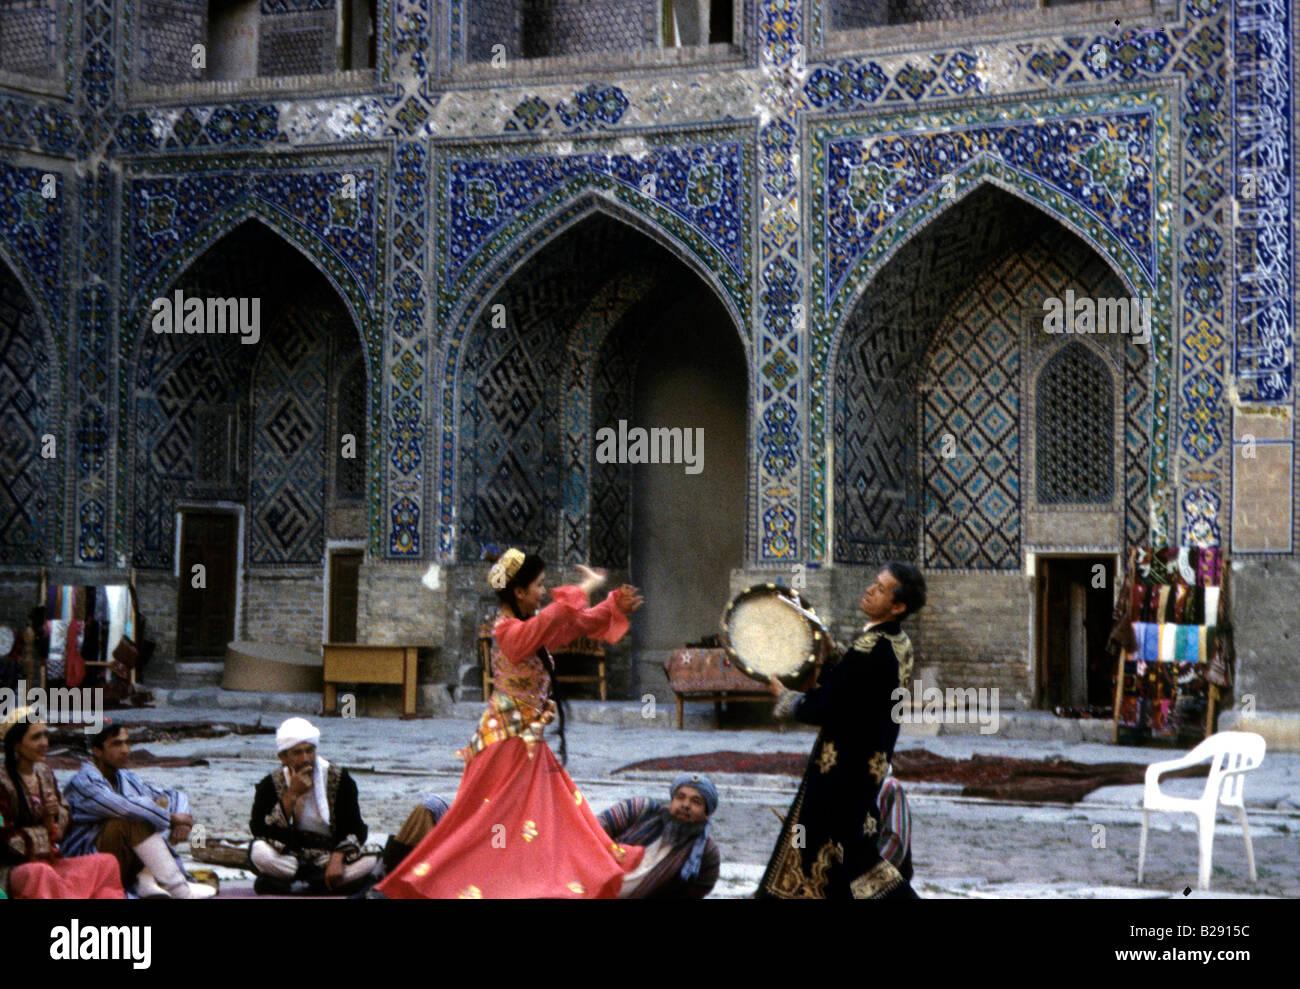 Folk Dancing Samarkand Uzbekistan Date 23 04 2008 Ref ZB955 113876 0021 COMPULSORY CREDIT World Pictures Photoshot - Stock Image